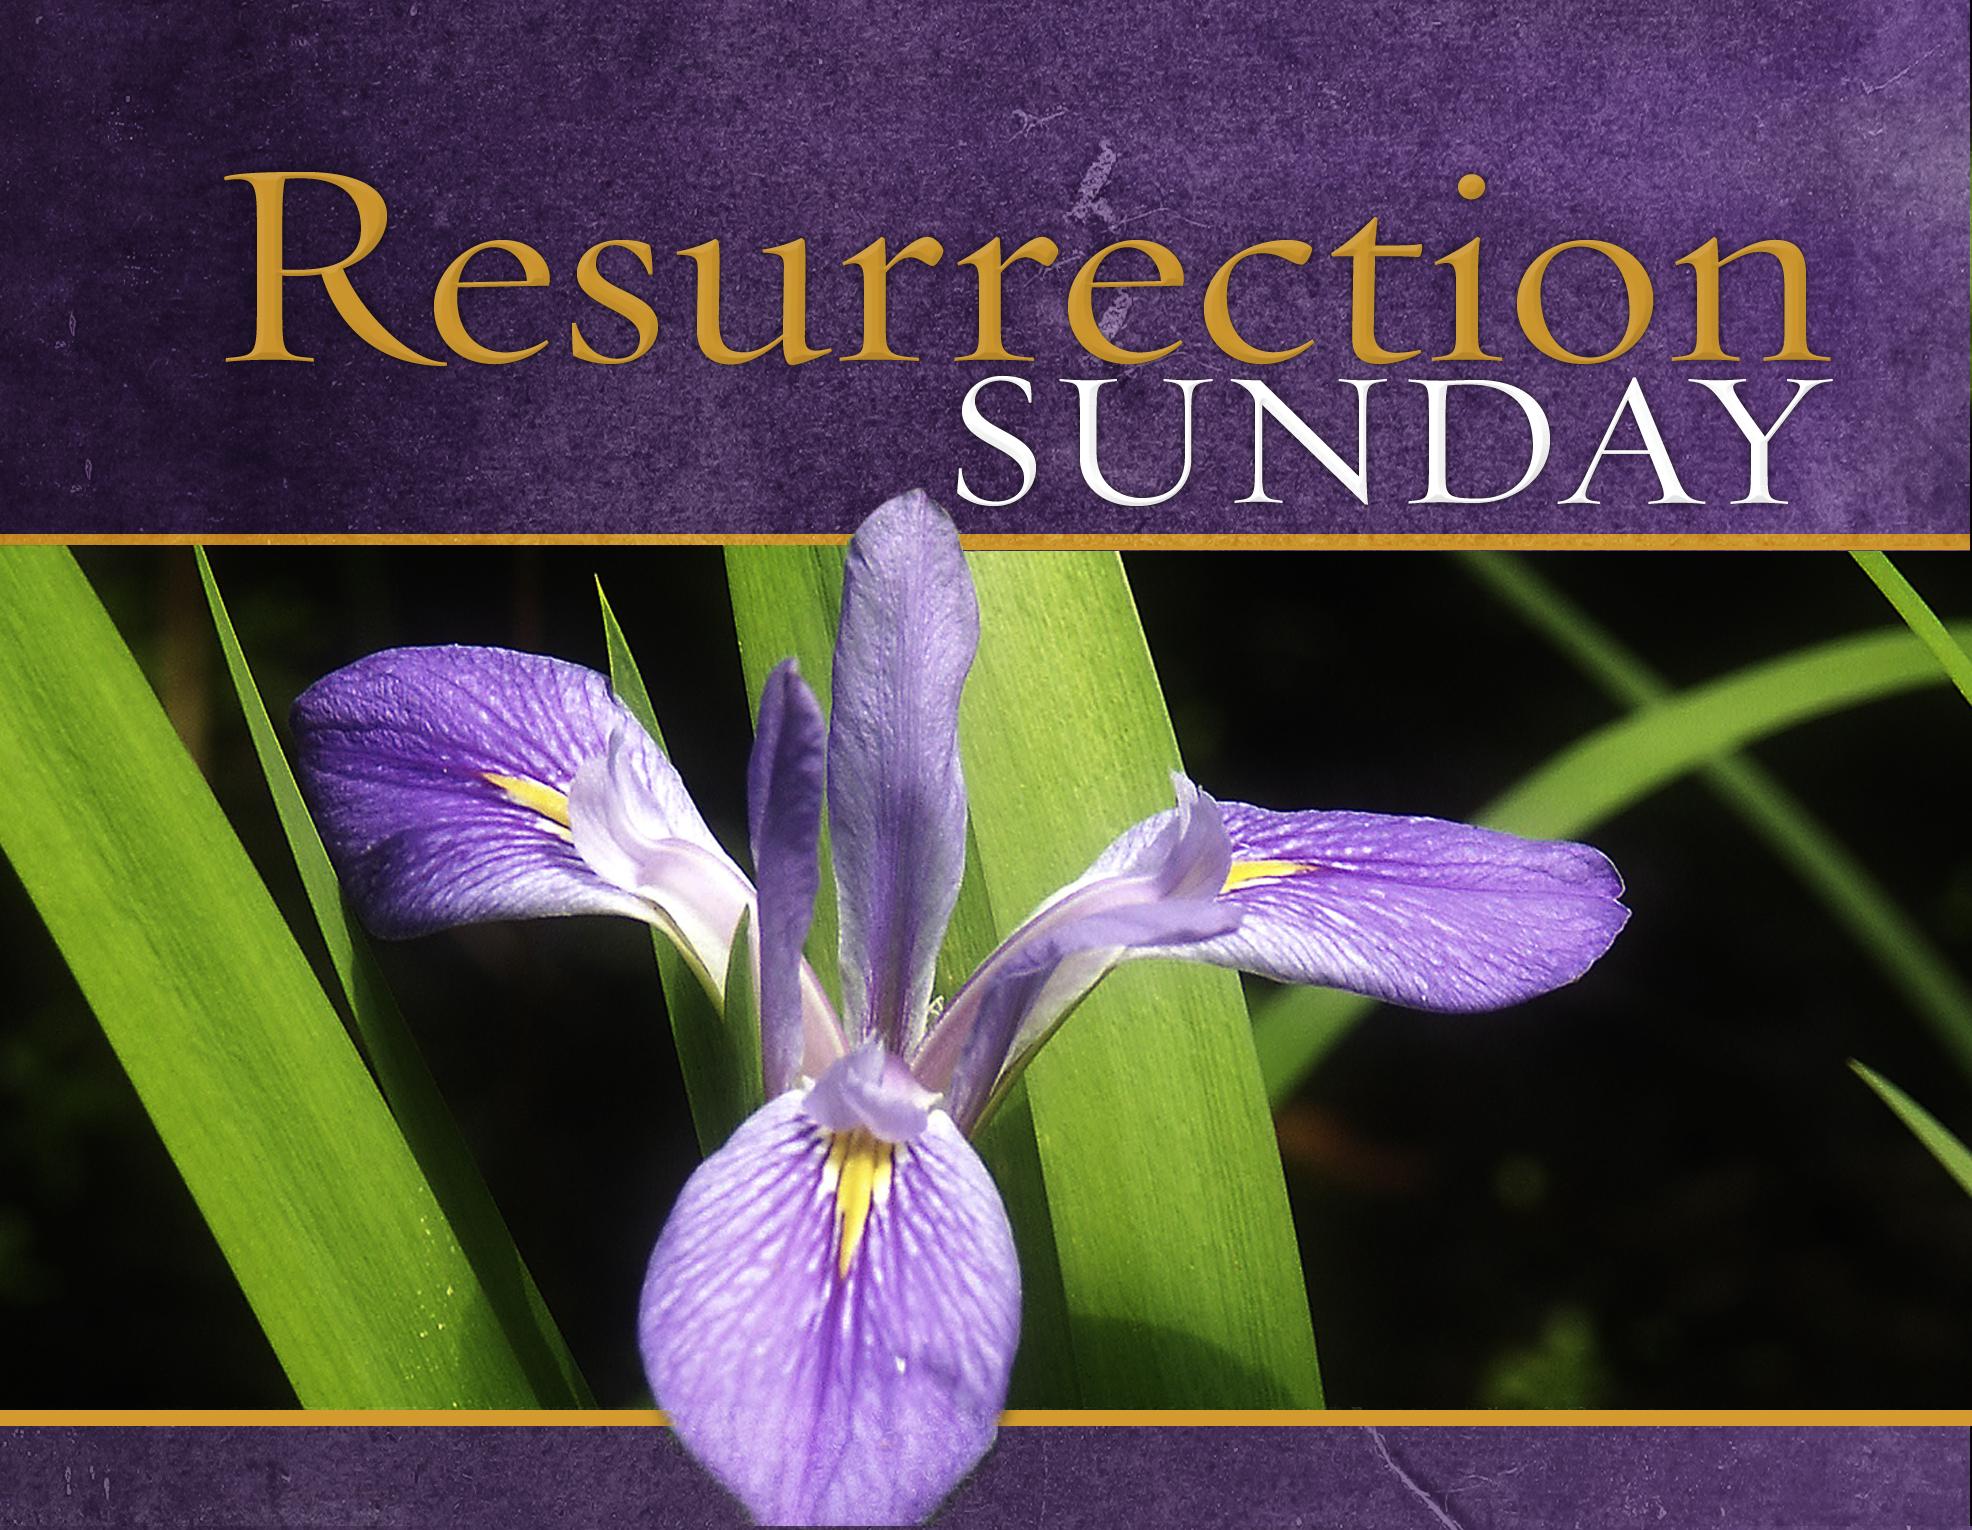 http://ministry127.com/sites/default/files/Resurrection%20Sunday-Easter%20(title).jpg